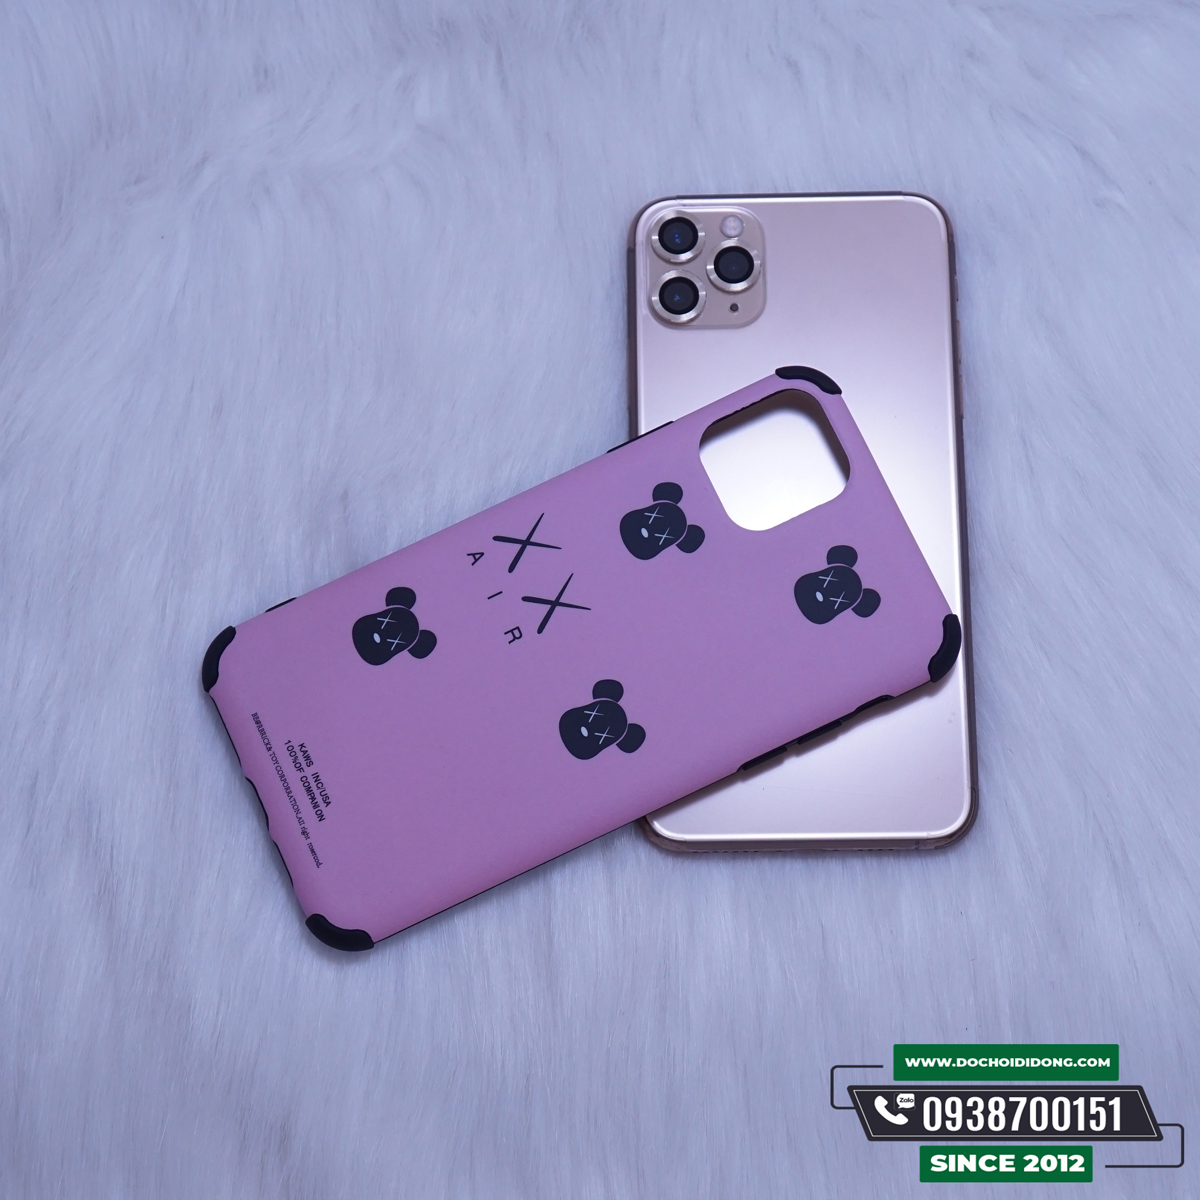 op-lung-hinh-dang-yeu-cho-iphone-11-pro-max